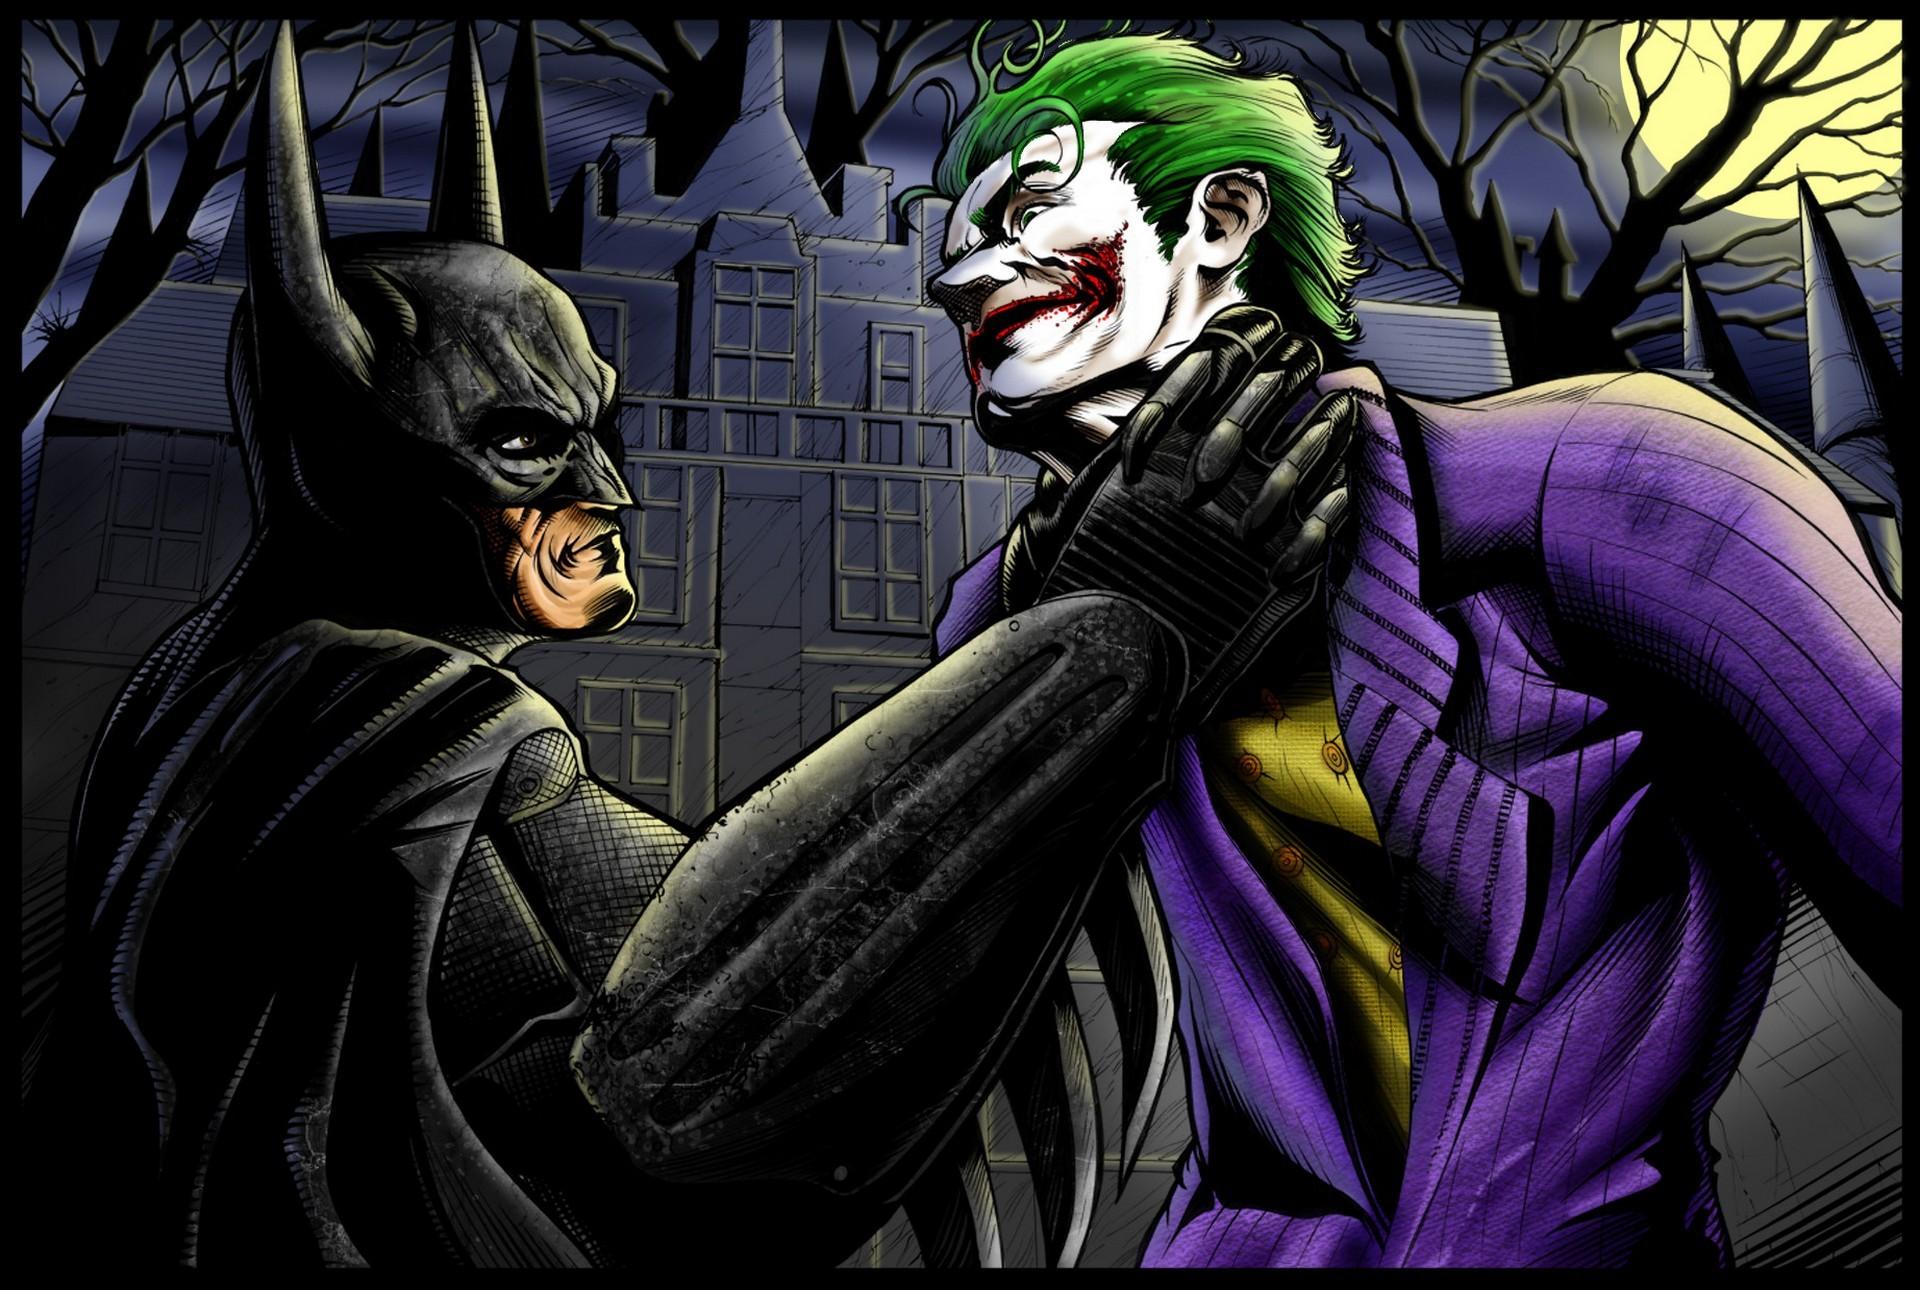 batman & joker Full HD Wallpaper and Background Image ...